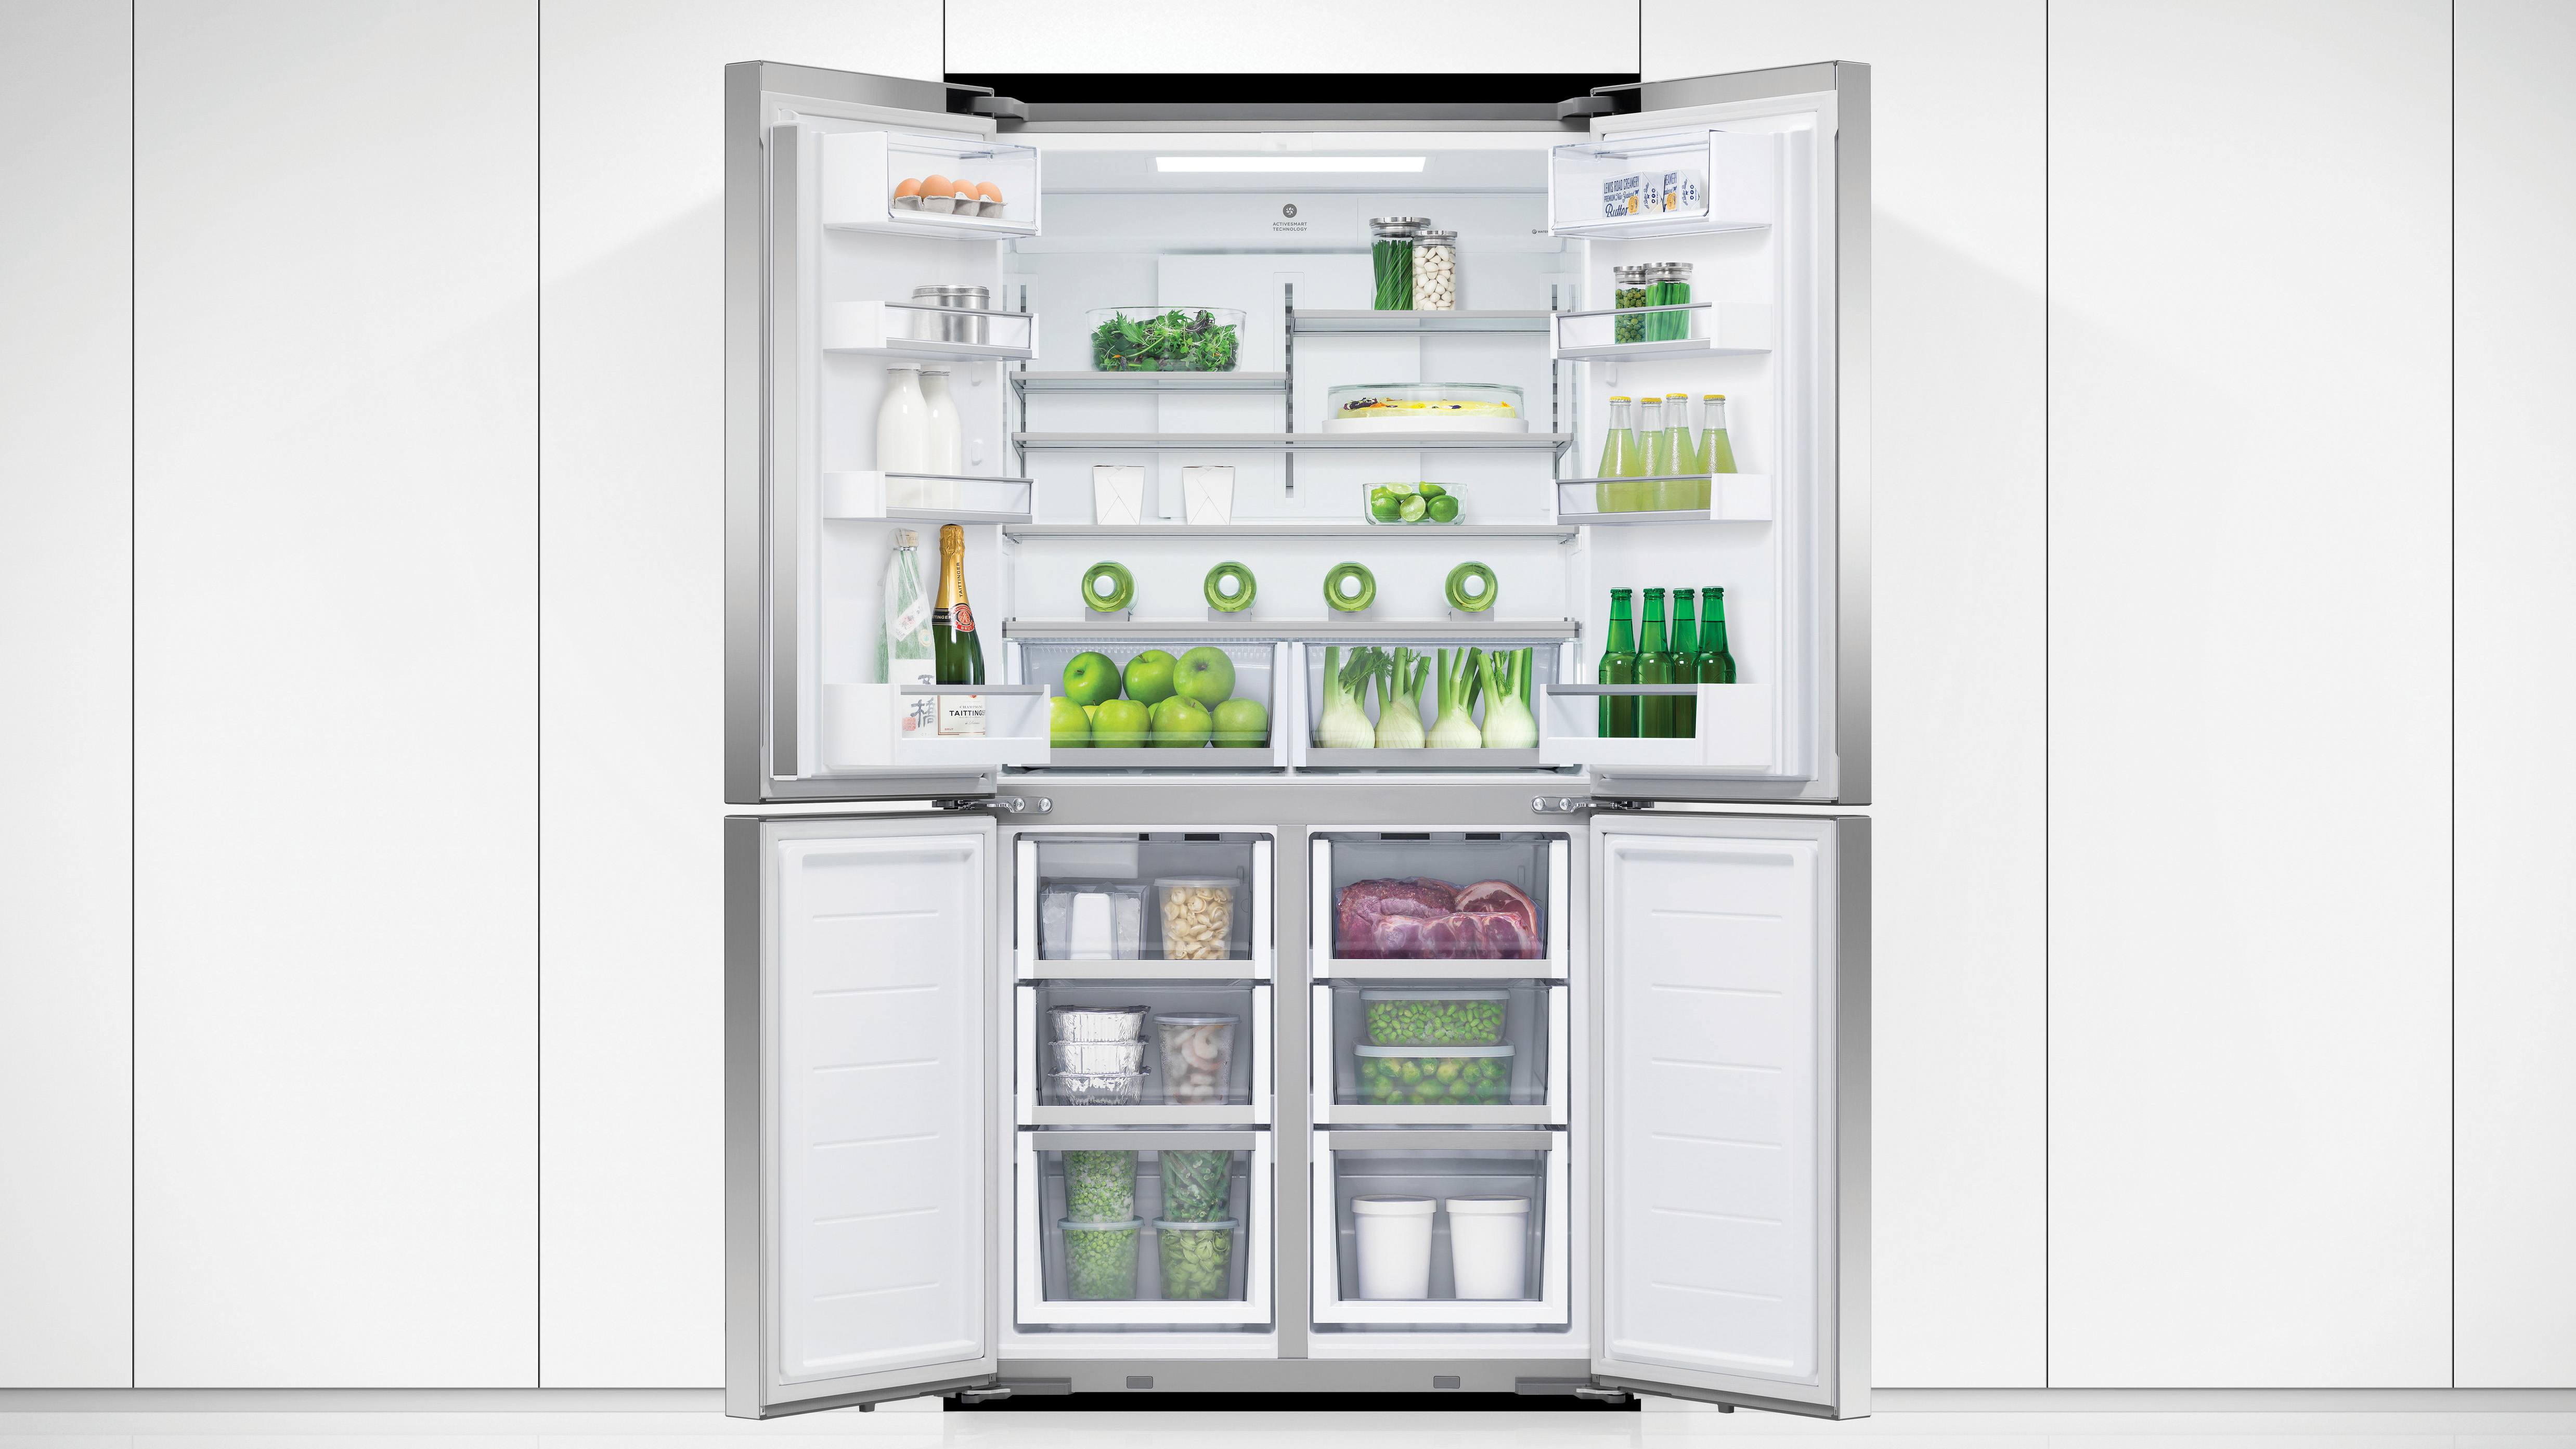 Best Fridge Freezer 10 Top Options Real Homes